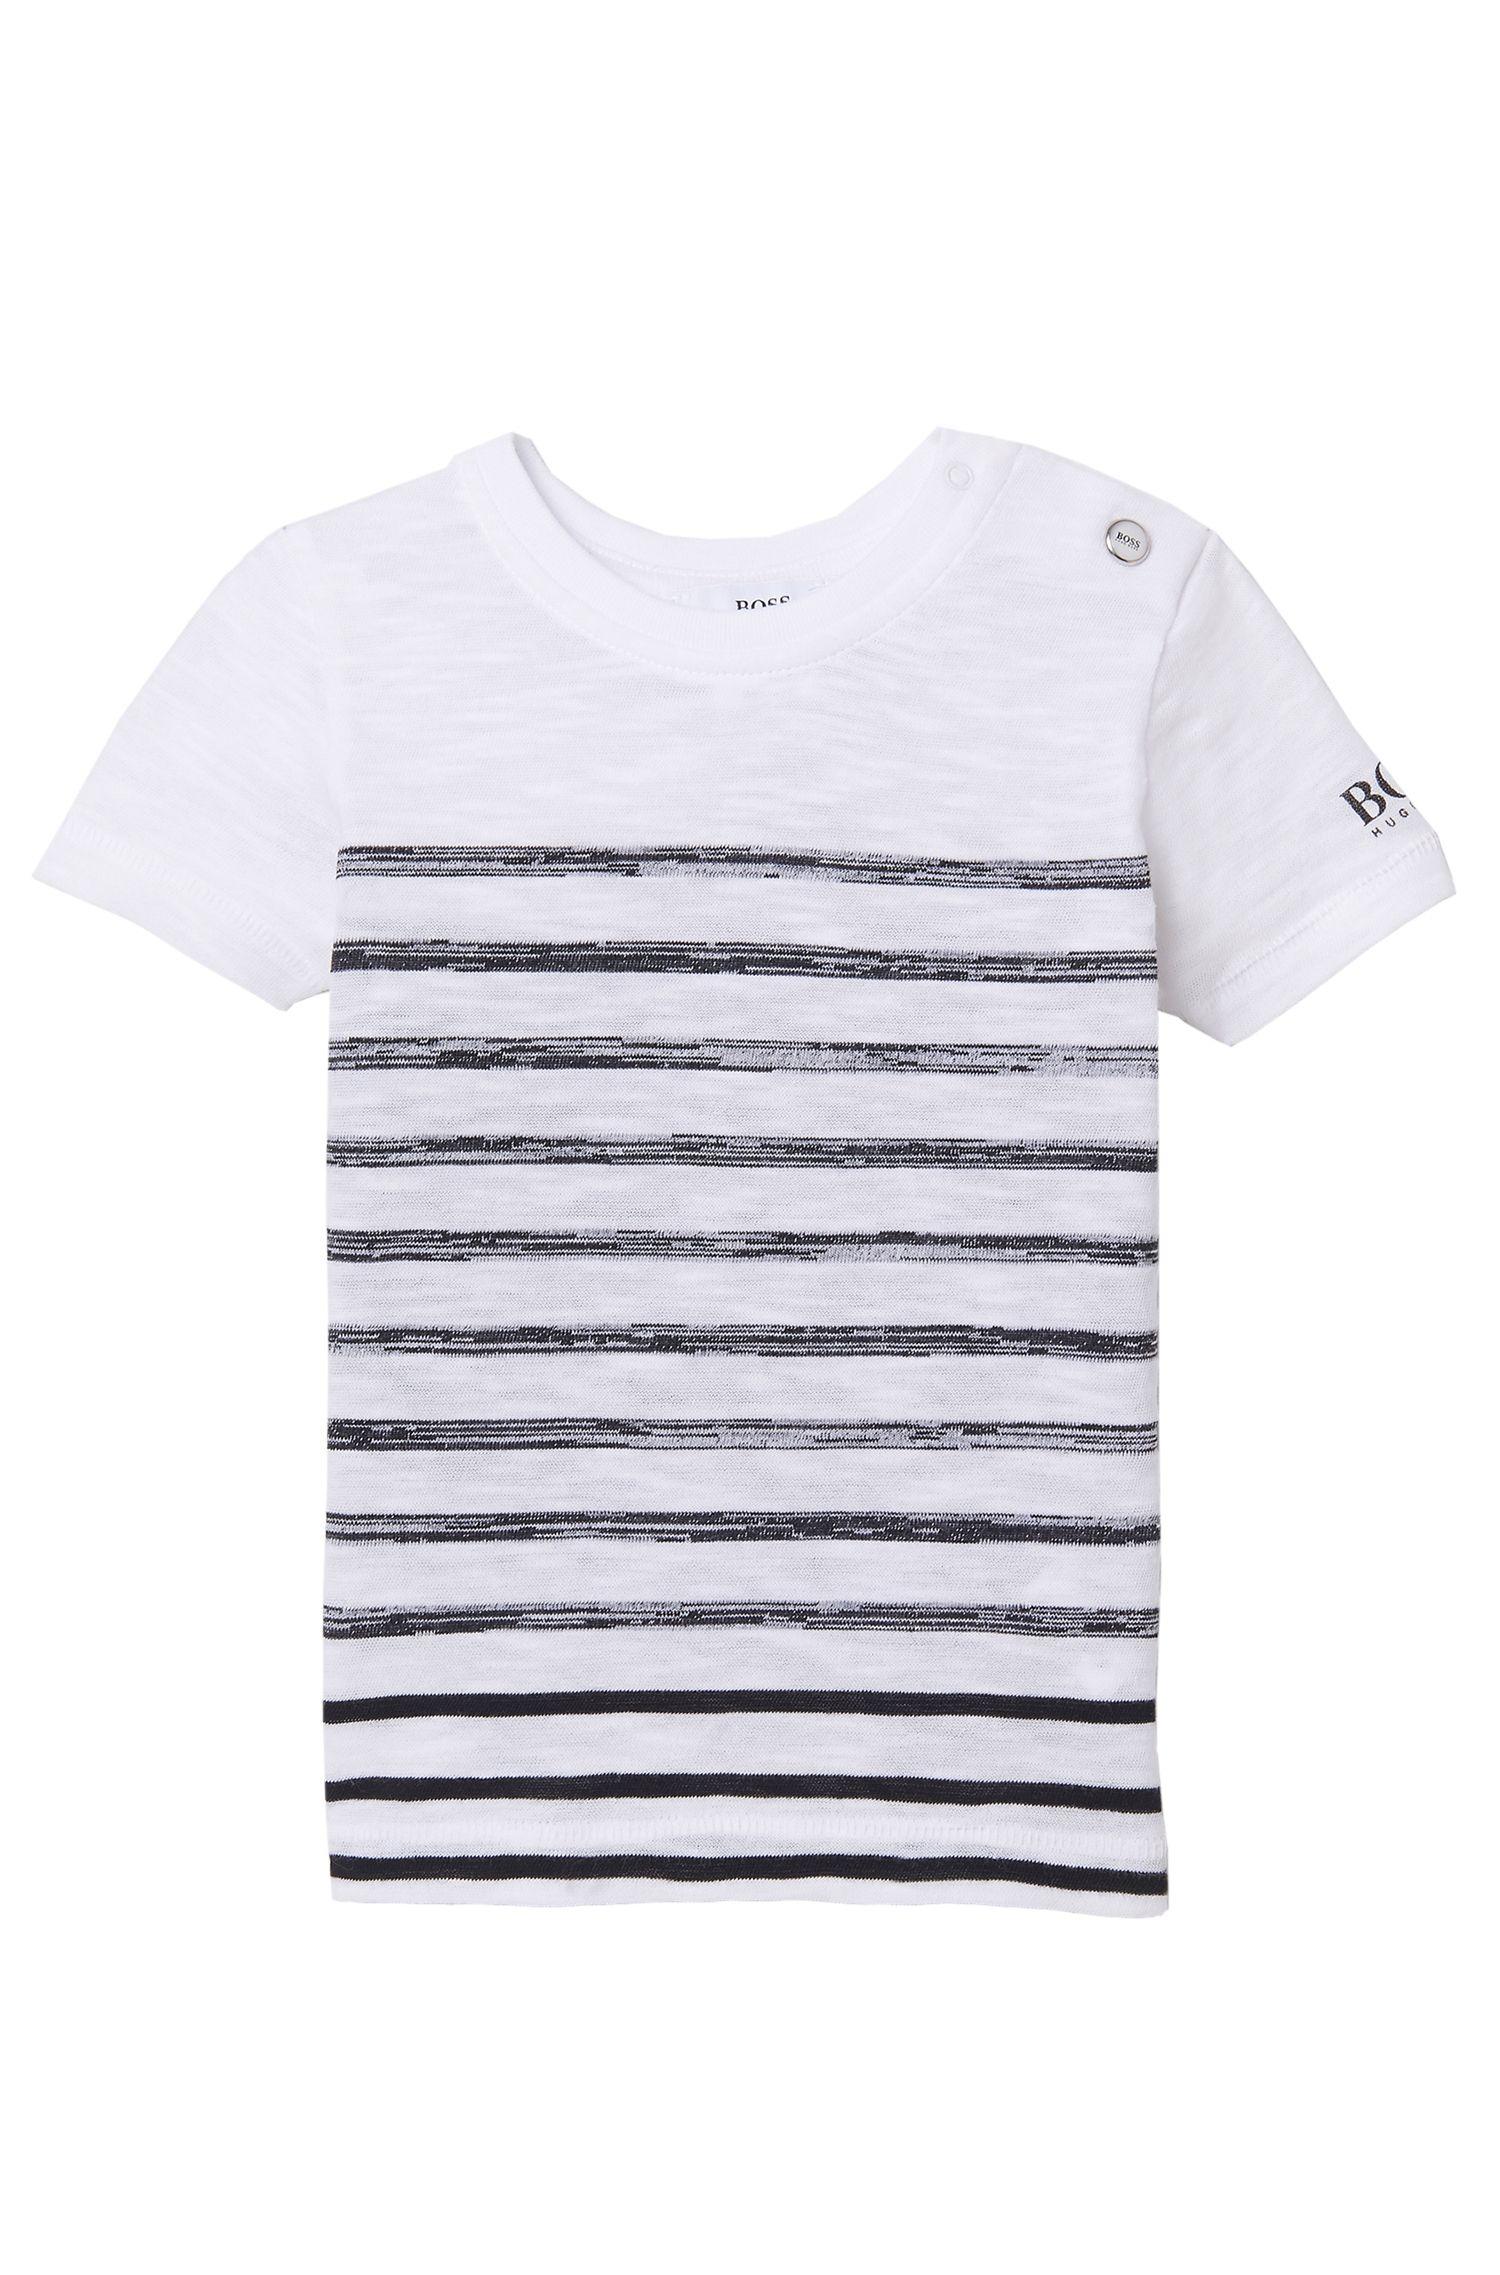 'J05460' | Toddler Cotton Striped Slub T-Shirt